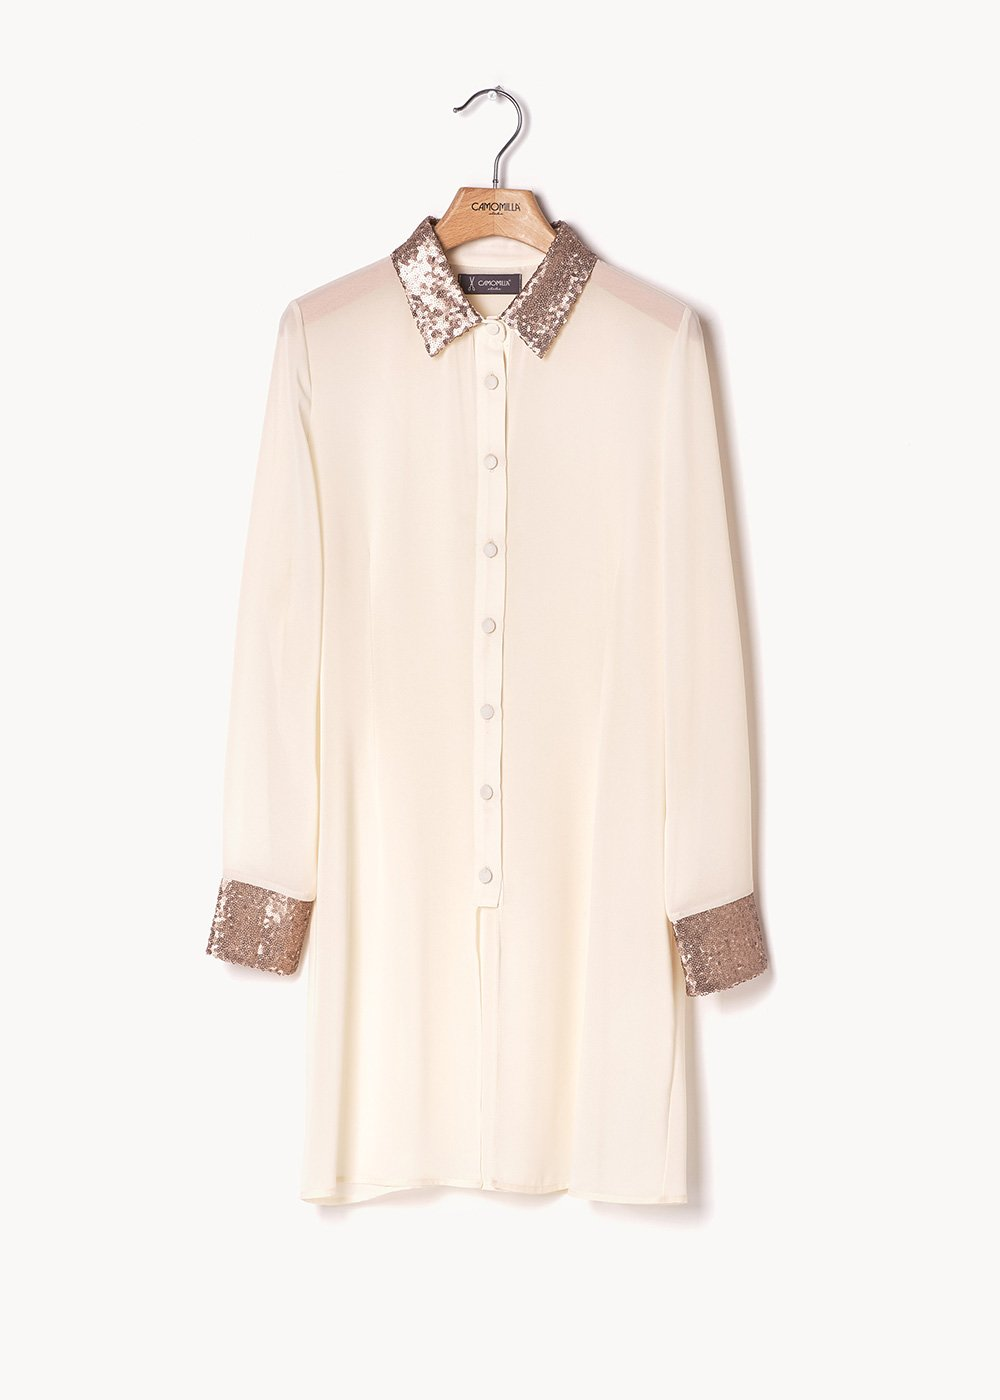 Camiseta shirt-dress with sequin detail